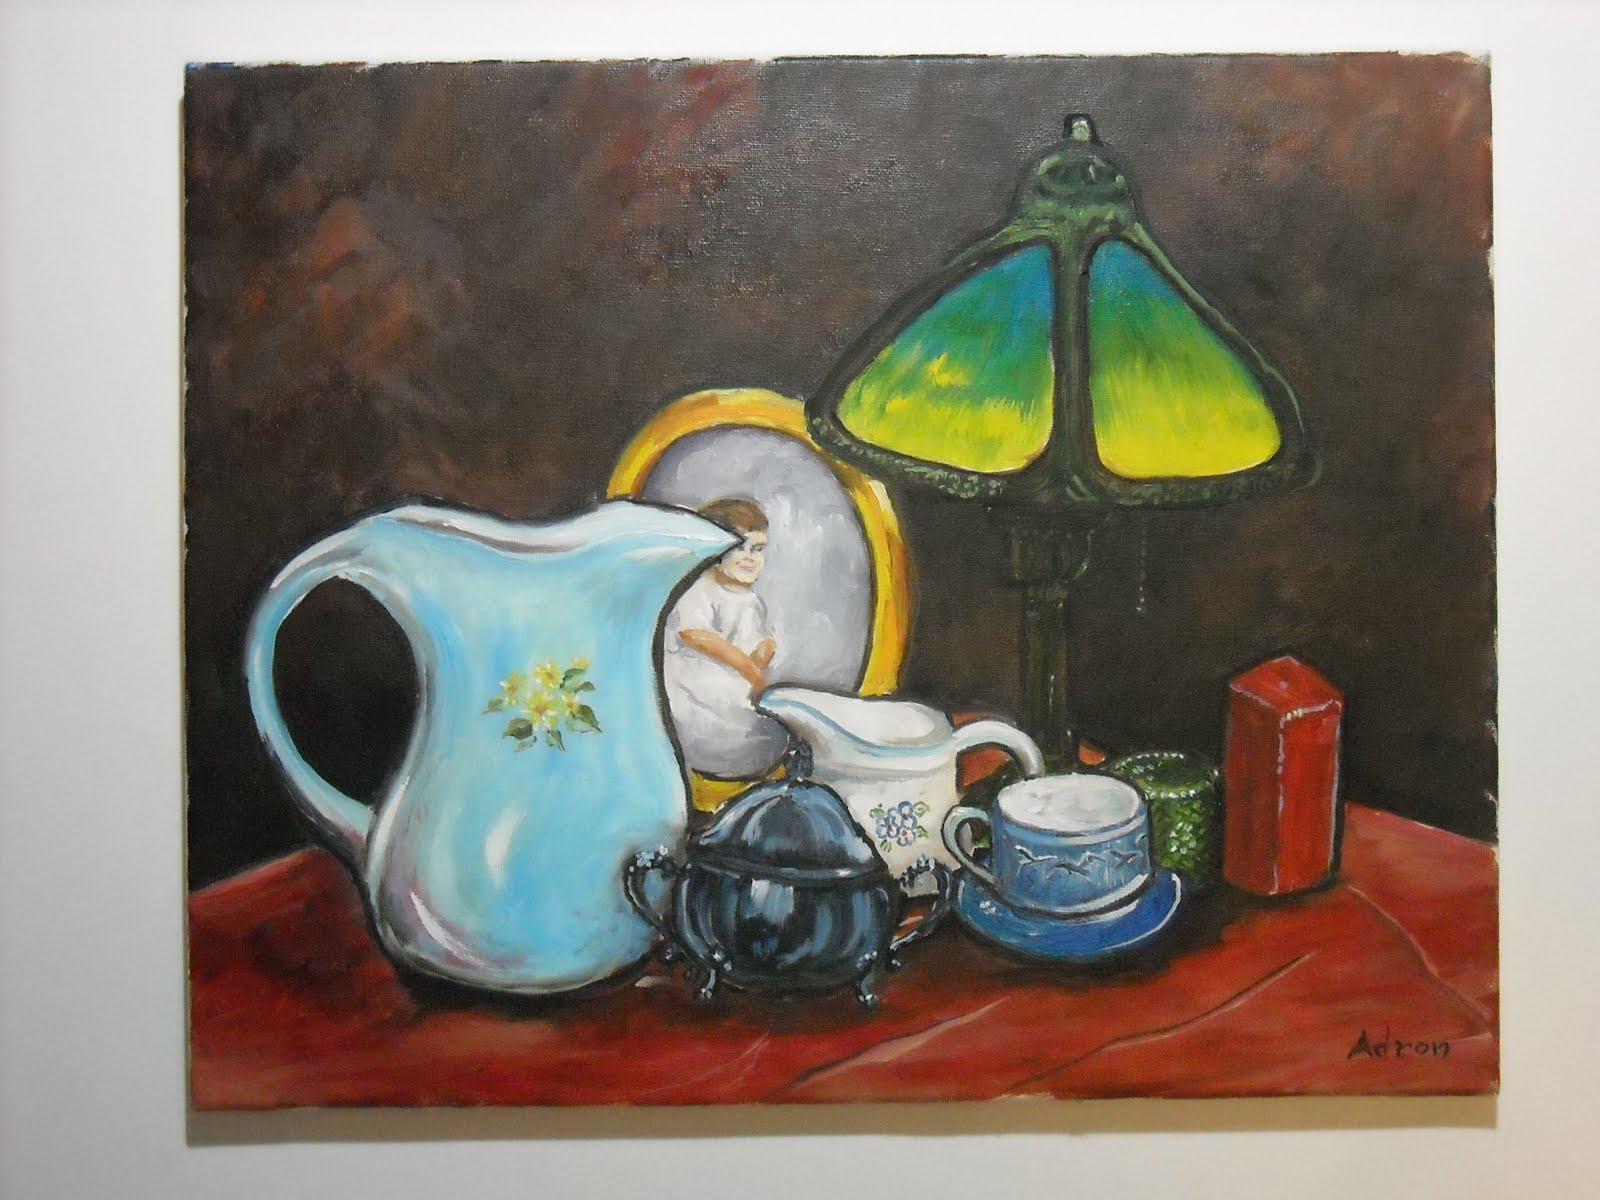 Artist Adron Still Life With Art Deco Lamp